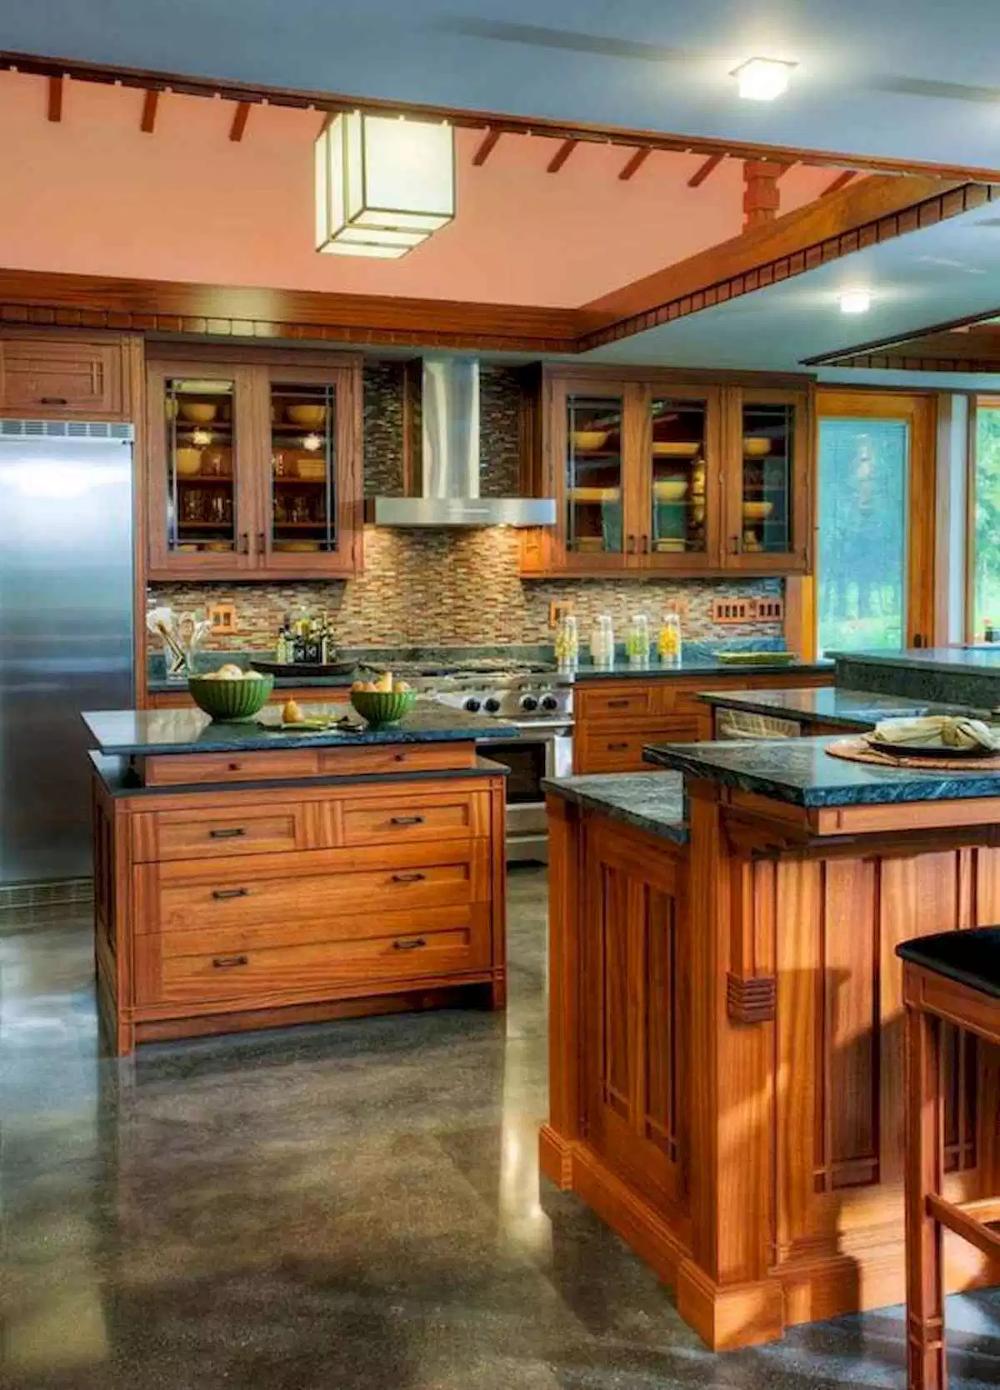 40 Awesome Craftsman Style Kitchen Design Ideas (8